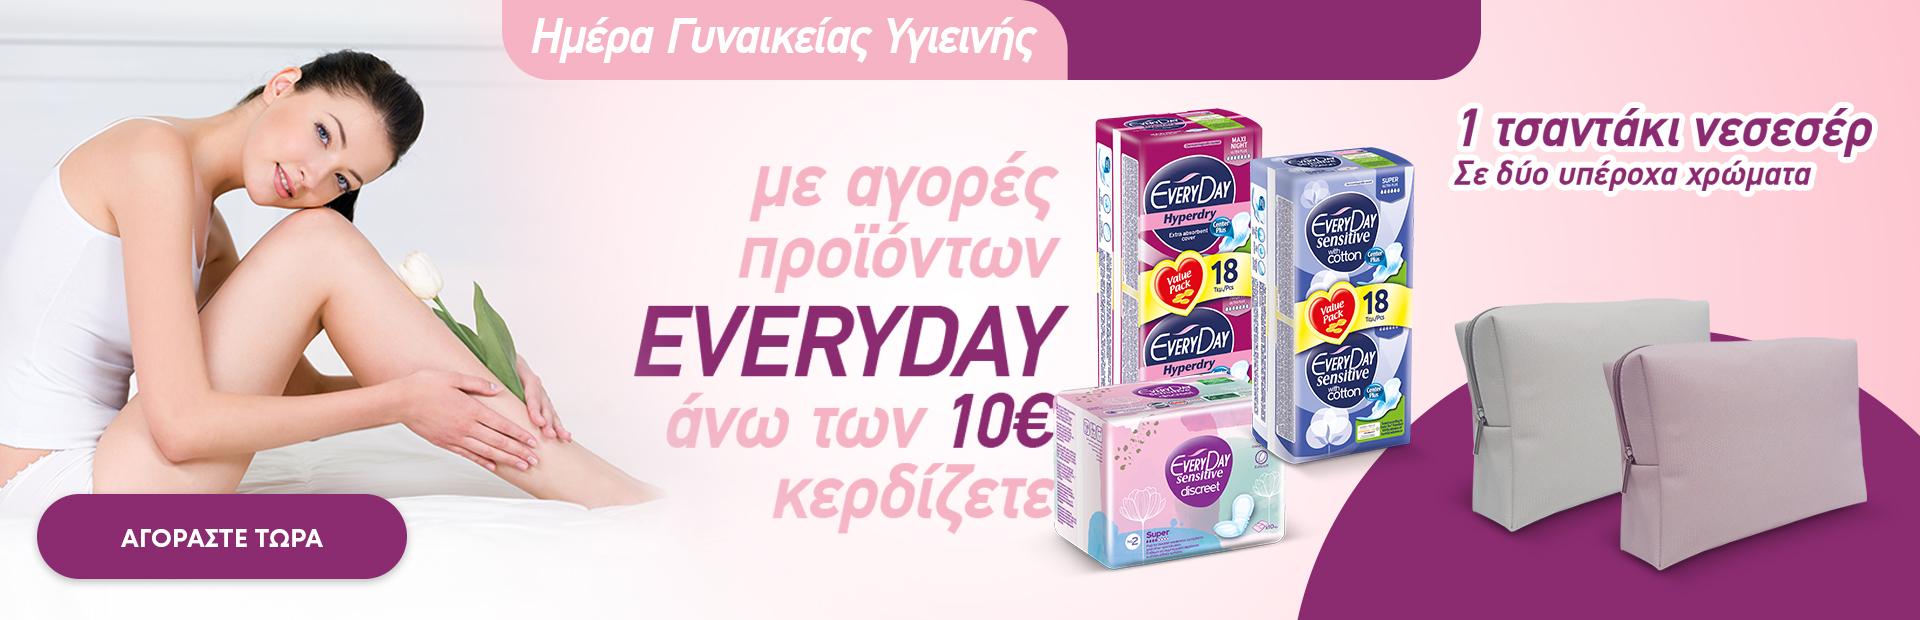 everyday servietes & servietakia